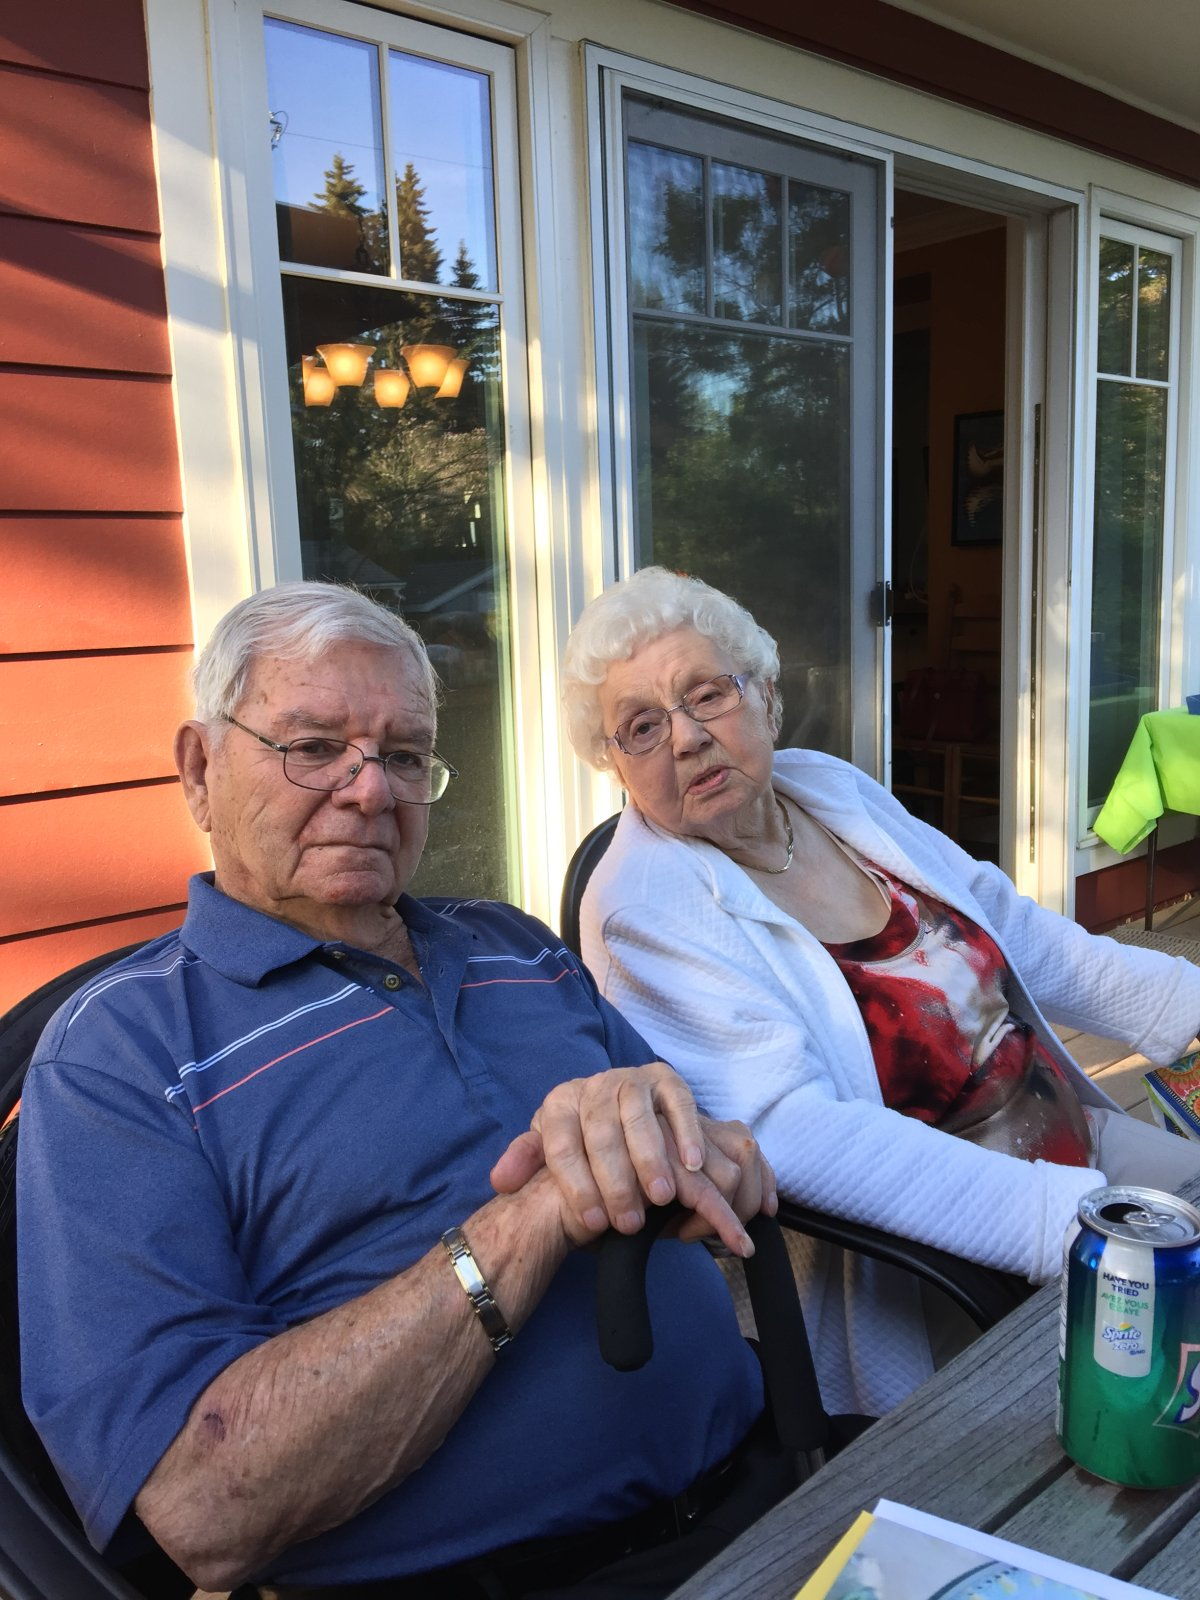 Michael's parents, Wolfgang and Margarete Sondermann.